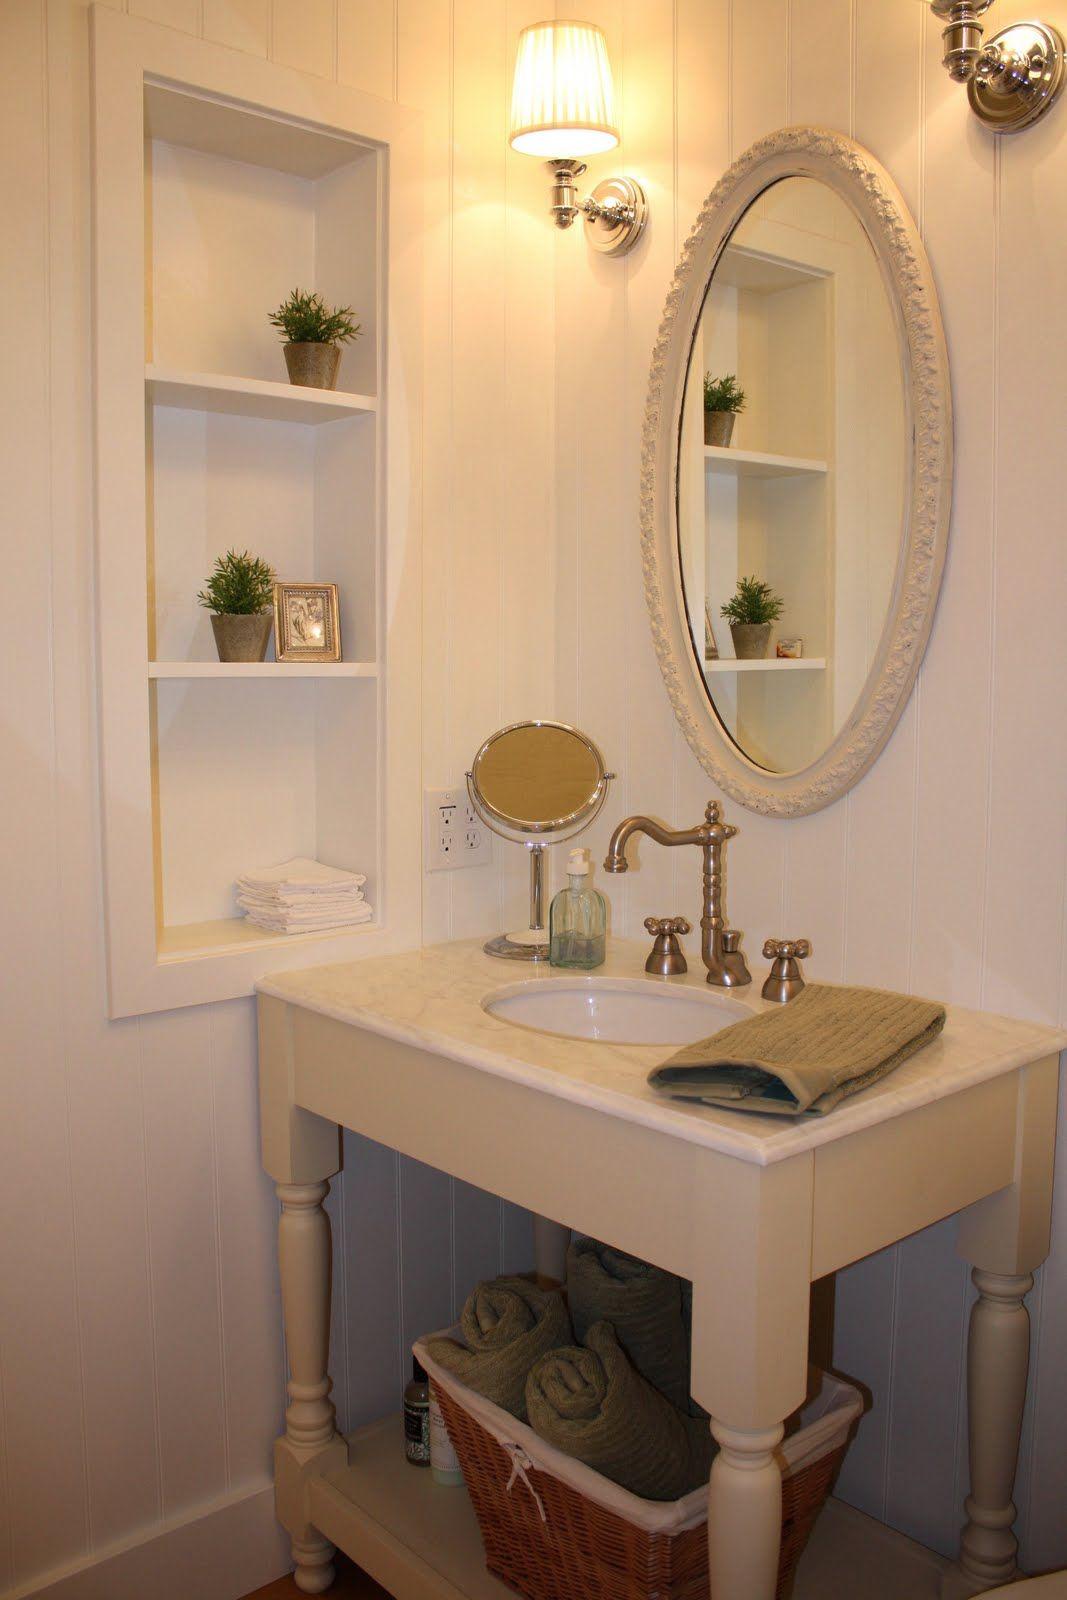 Remarkable bathroom shelf by ashley in bathroom vanity shelf